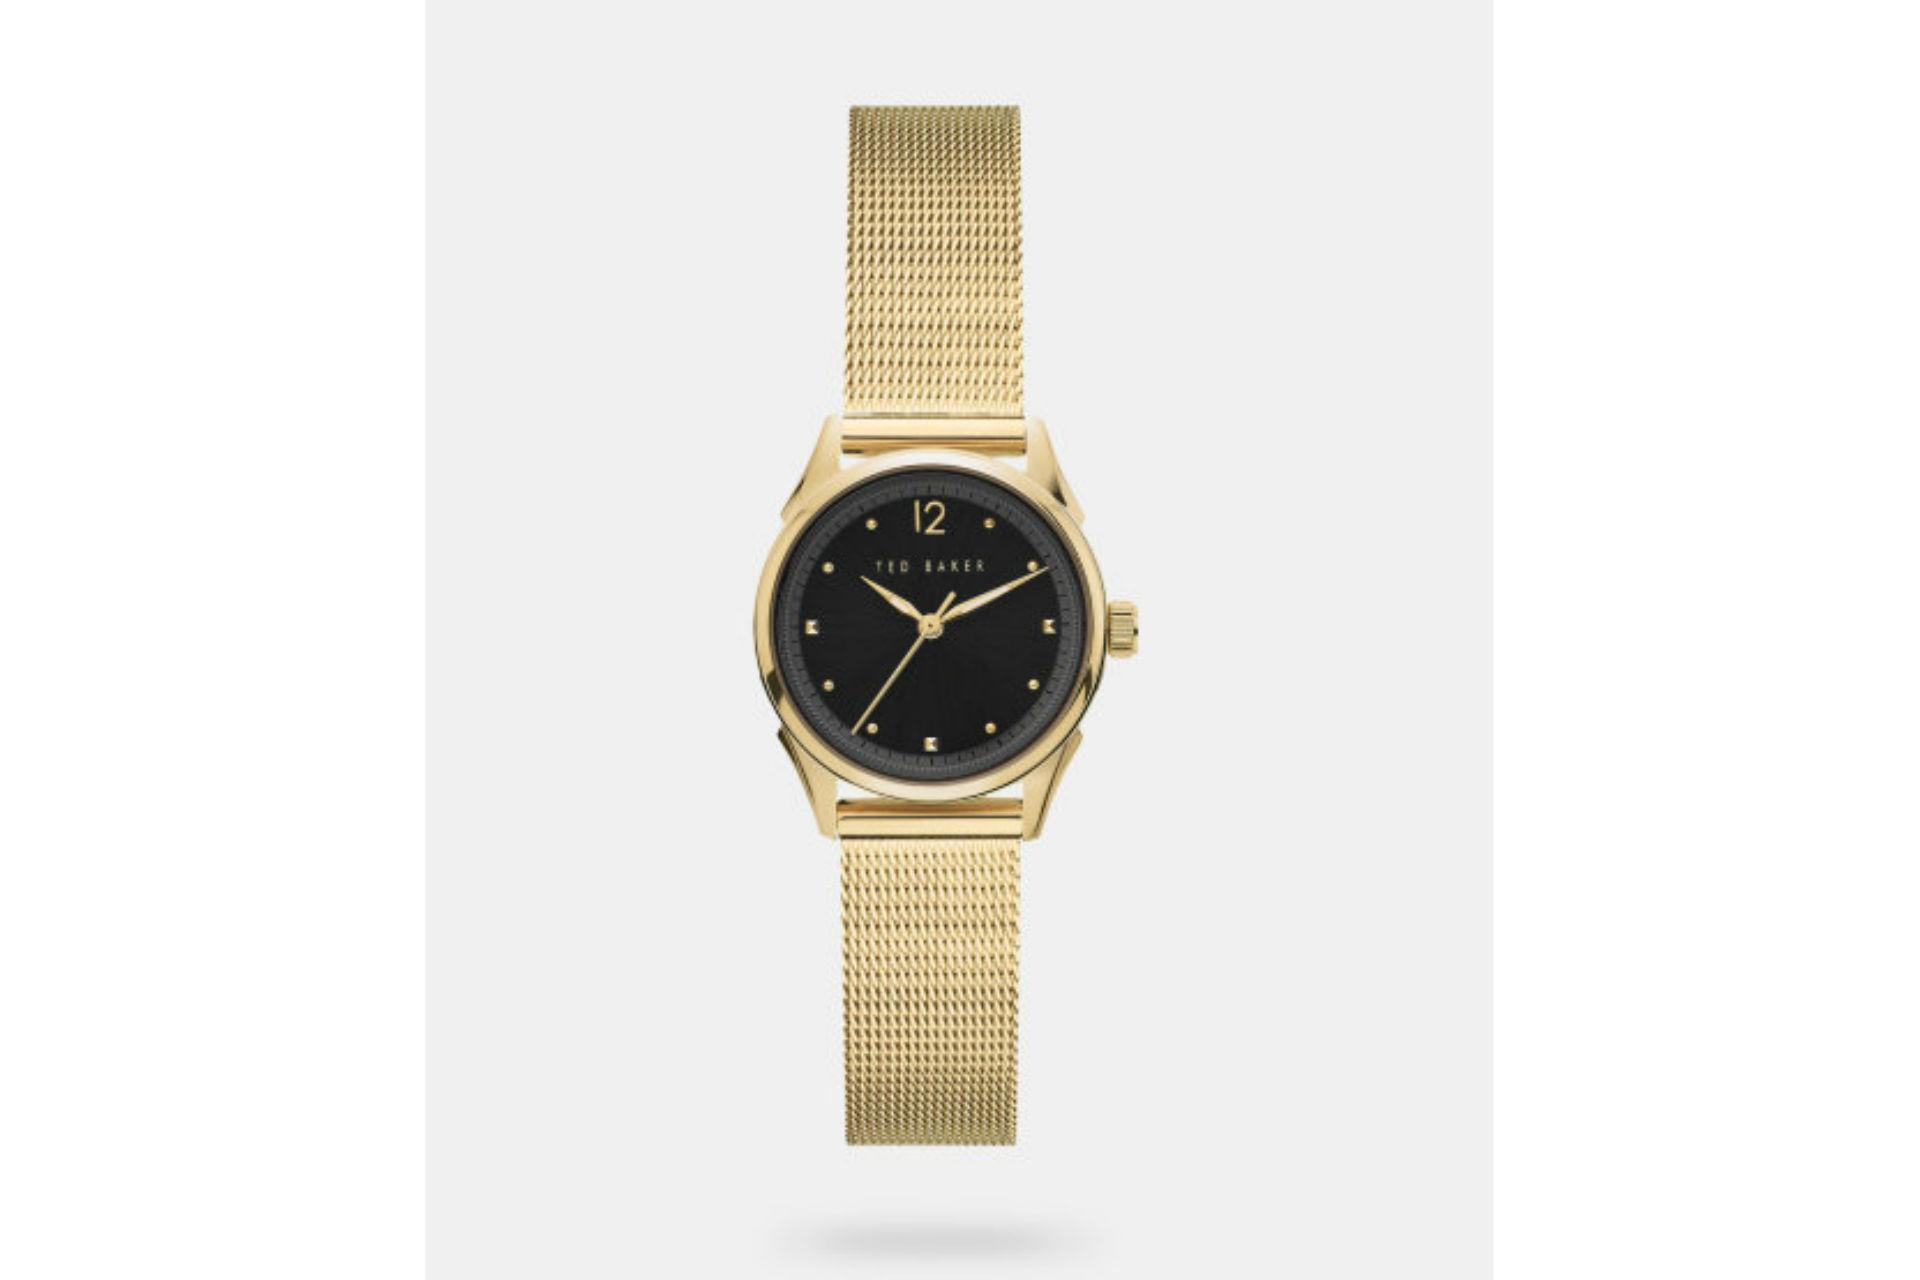 LUCHIAA Milanese mesh strap watch